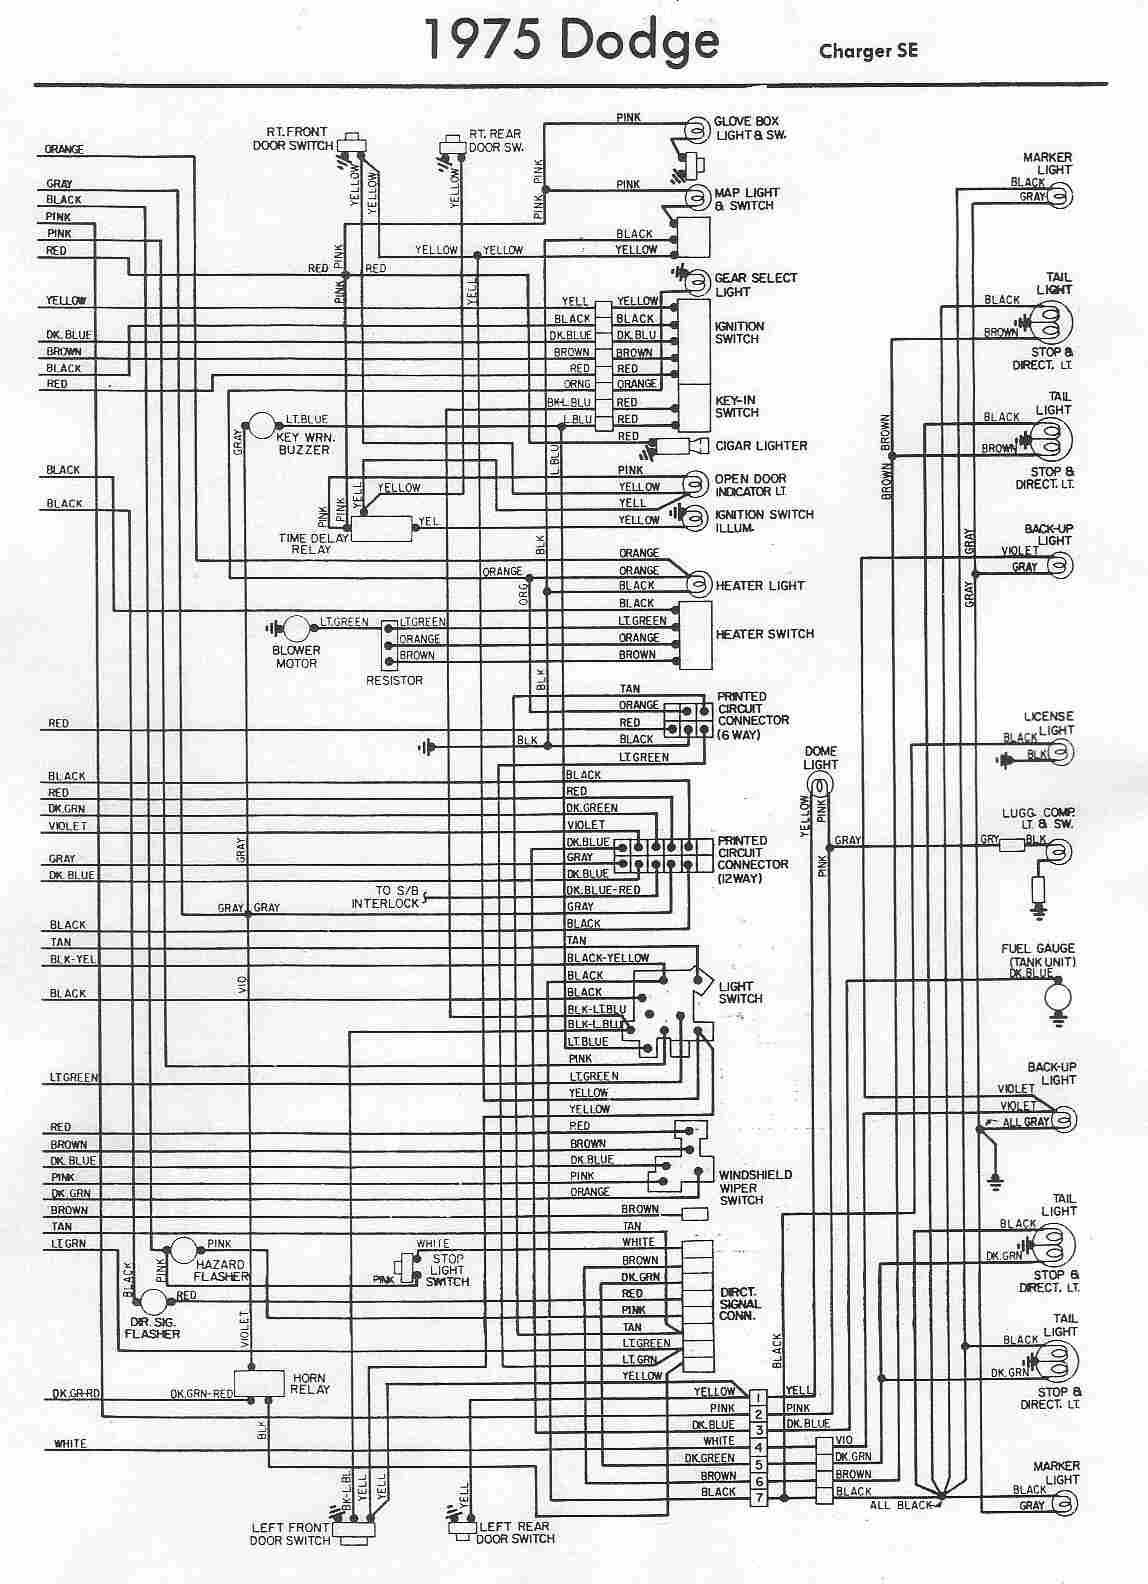 1994 dodge ram gauge cluster diagram wiring diagram1994 dodge ram gauge cluster diagram [ 1148 x 1584 Pixel ]